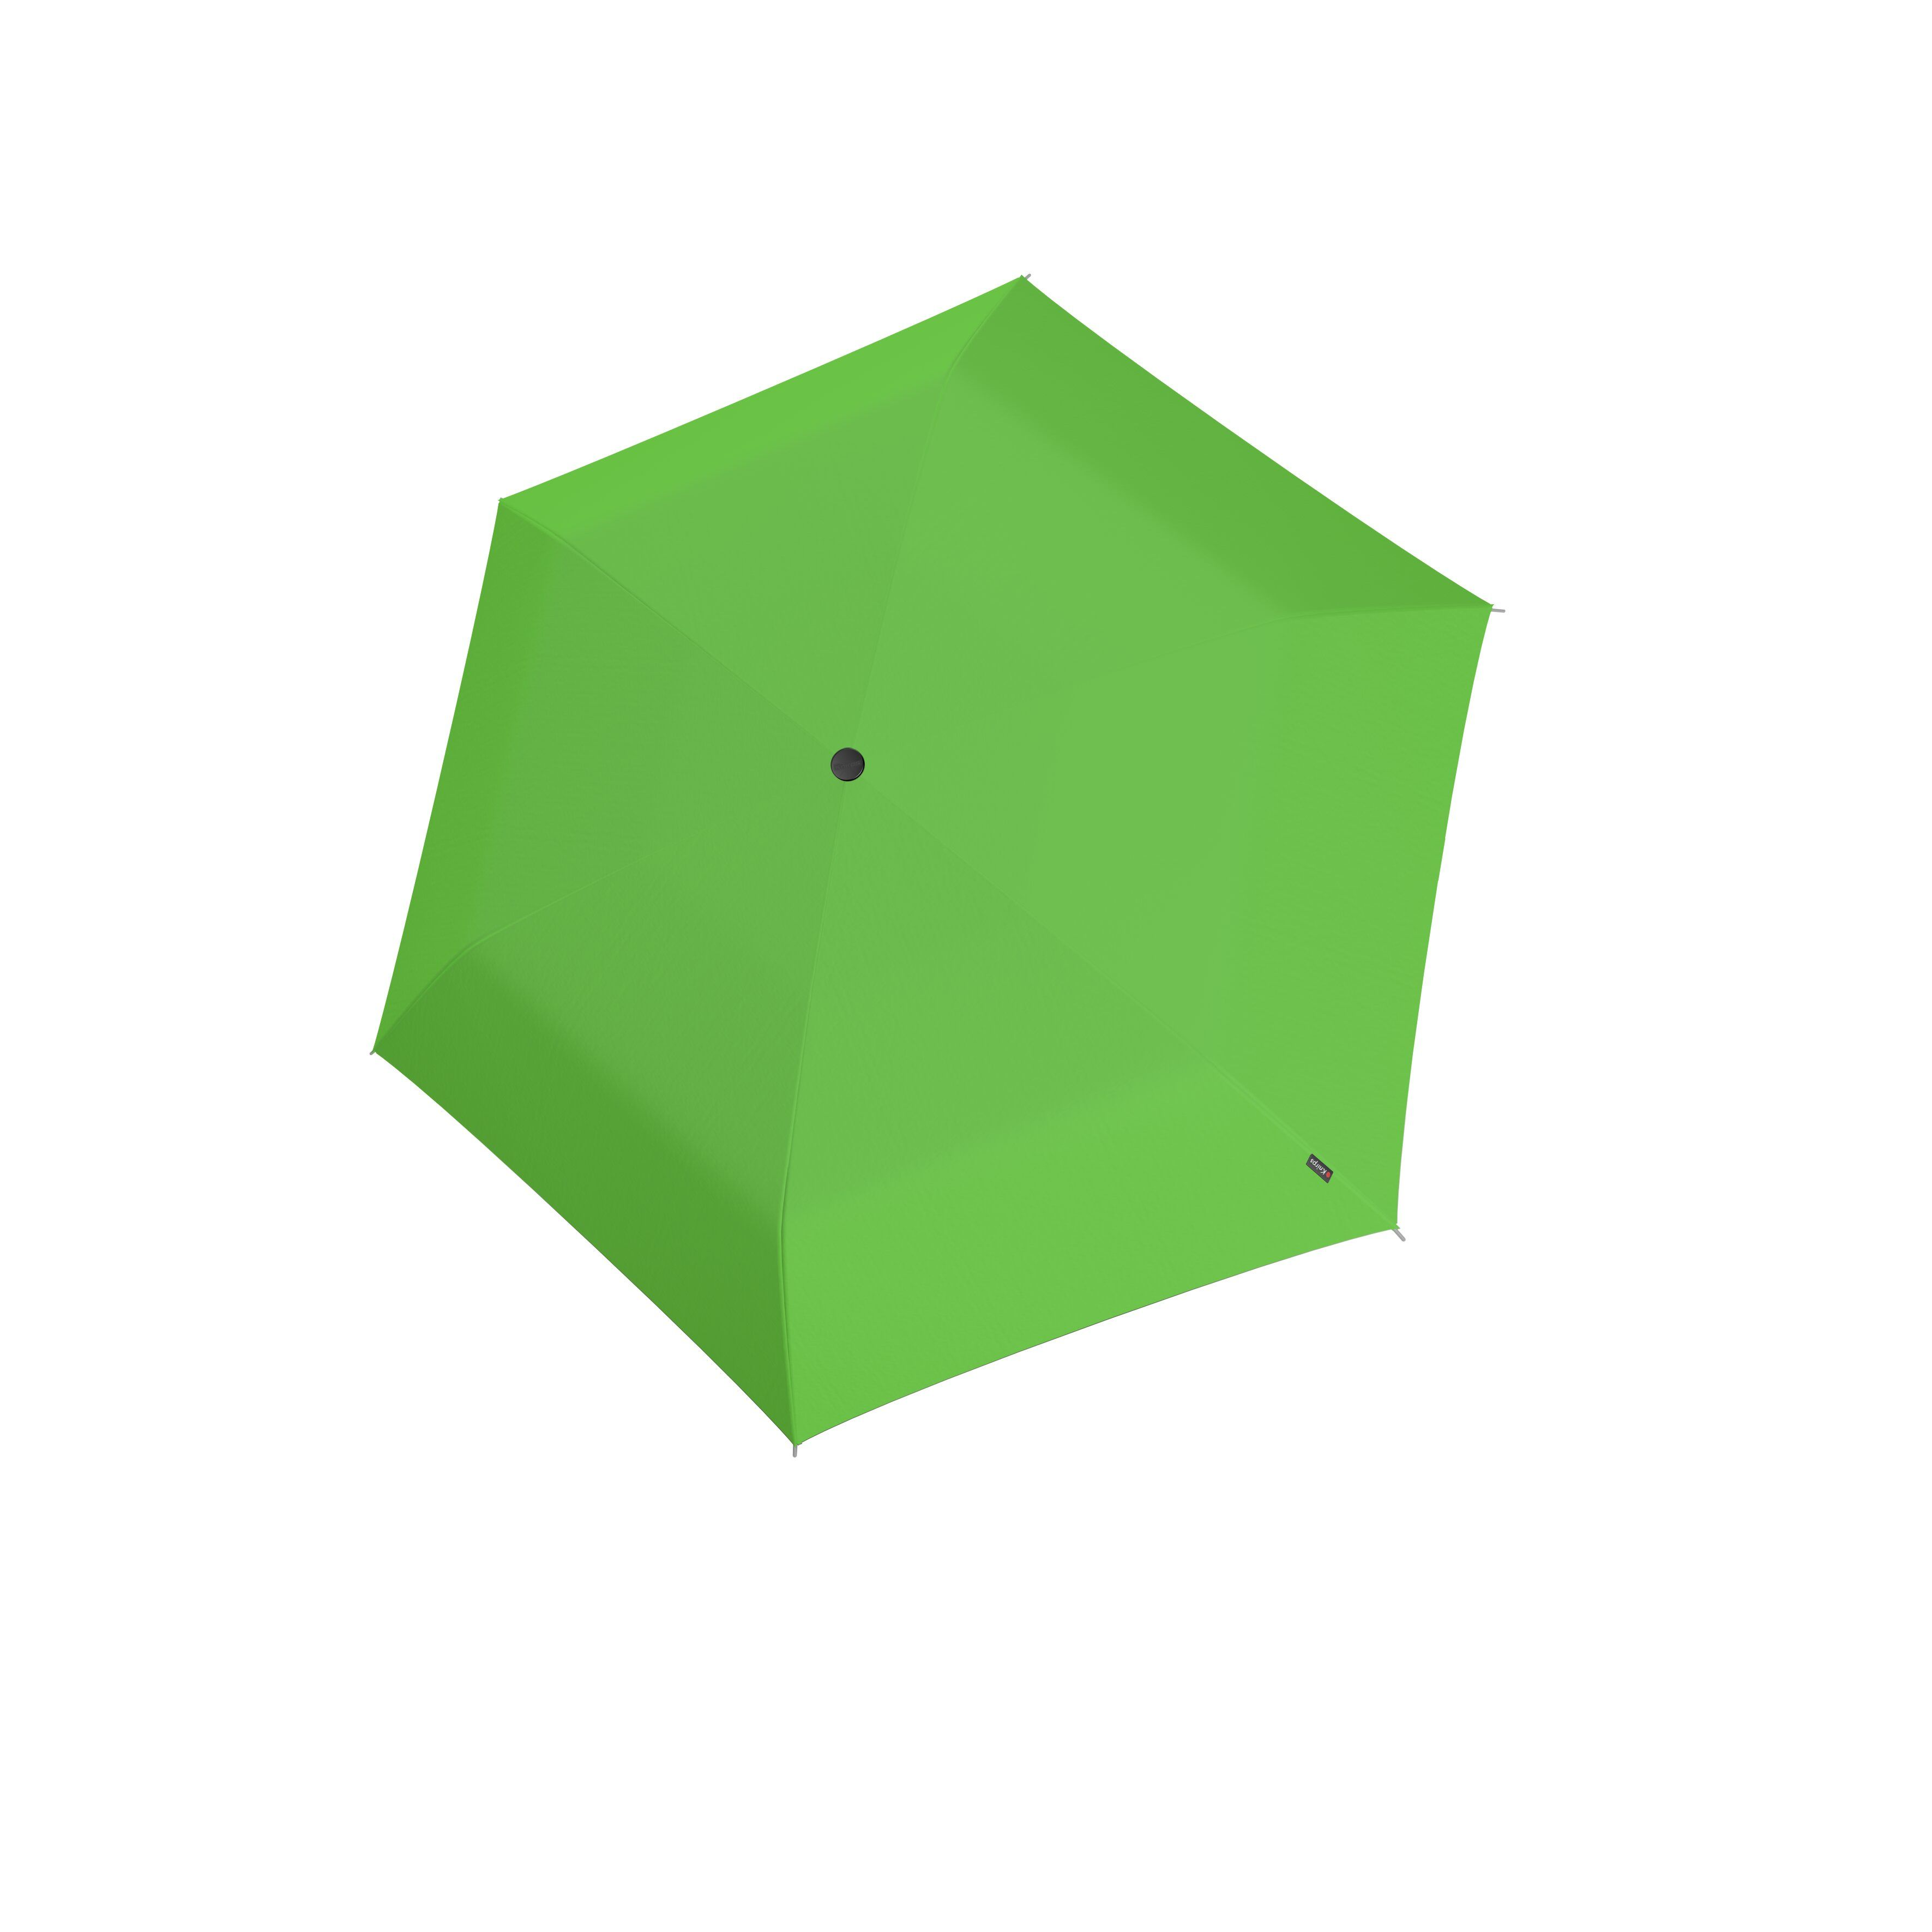 Knirps Umbrella US.050 ultra light slim manual - photo 2